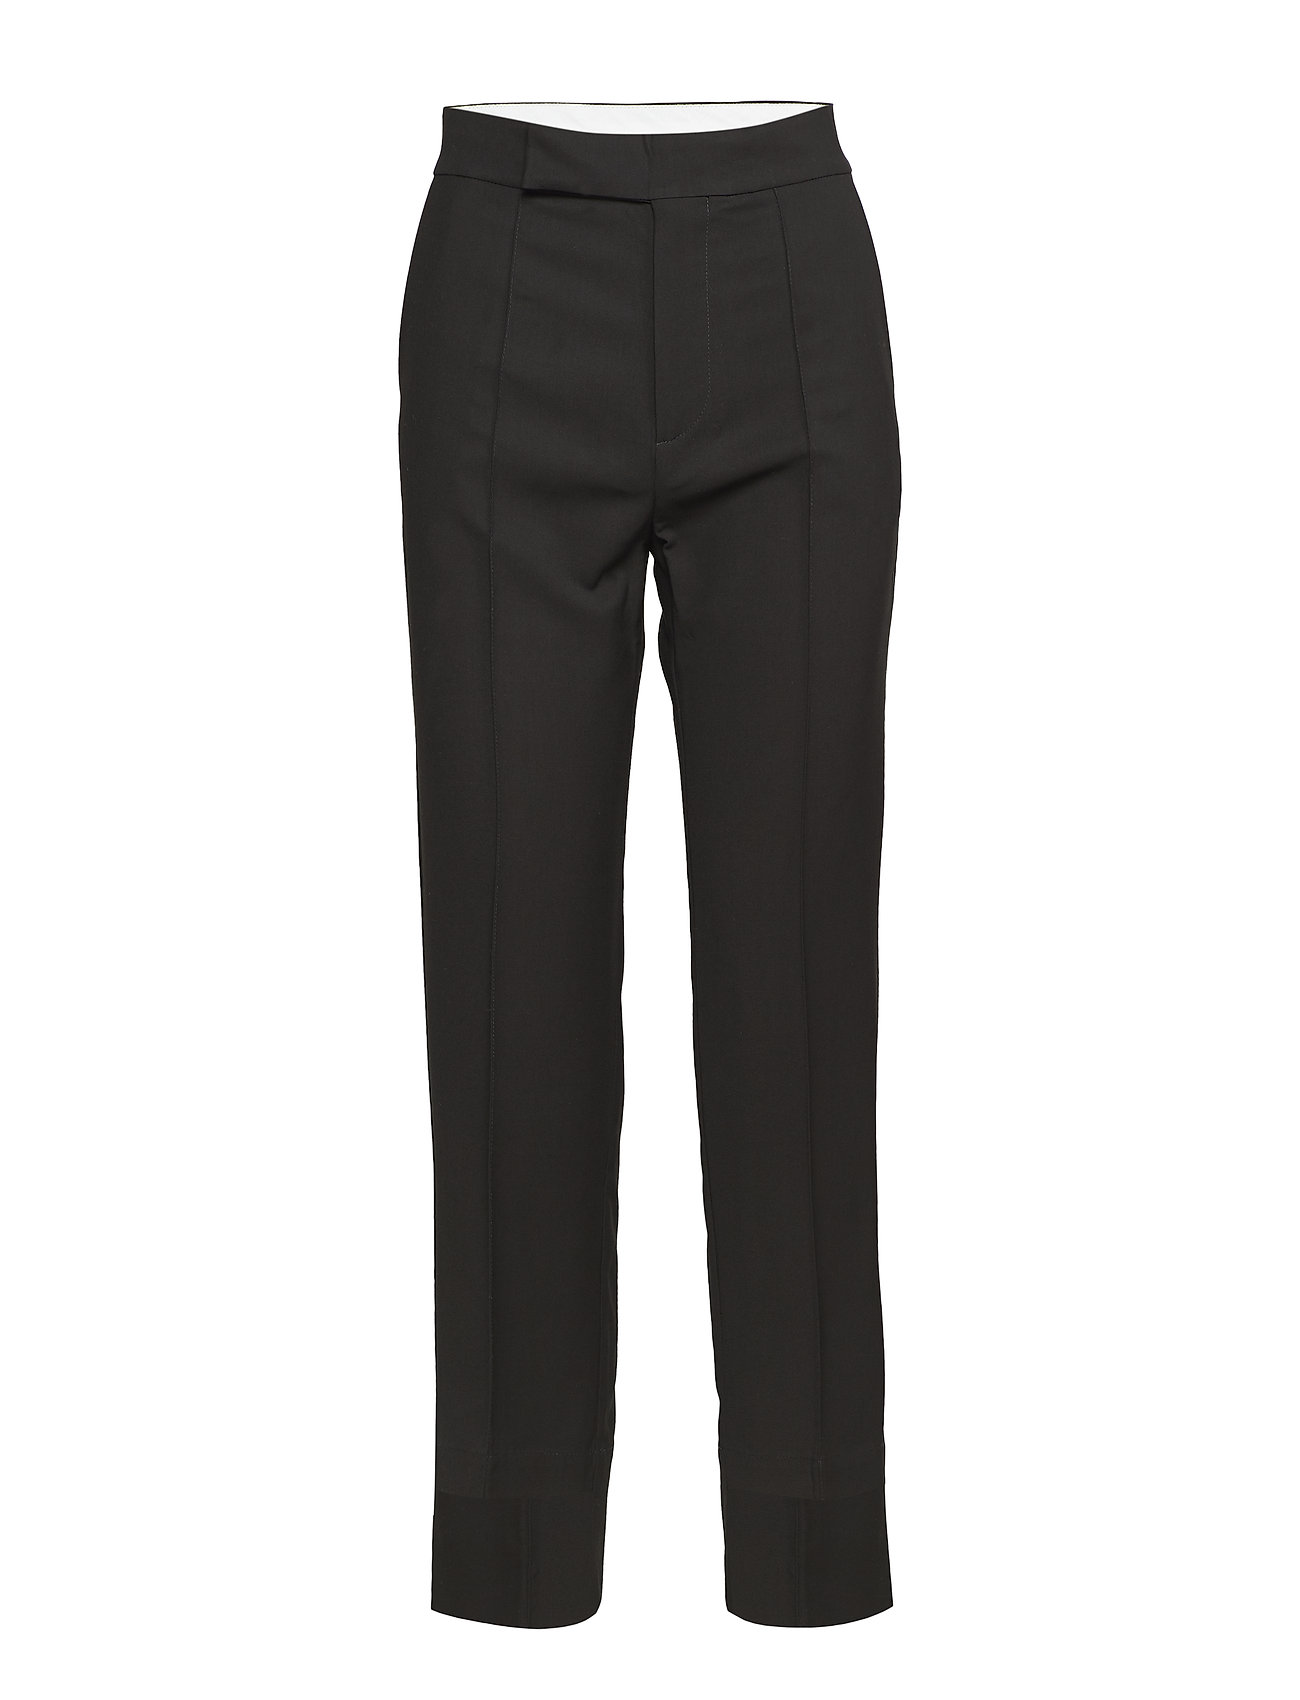 ÁERON asymmetric hem cigarette pants - BLACK